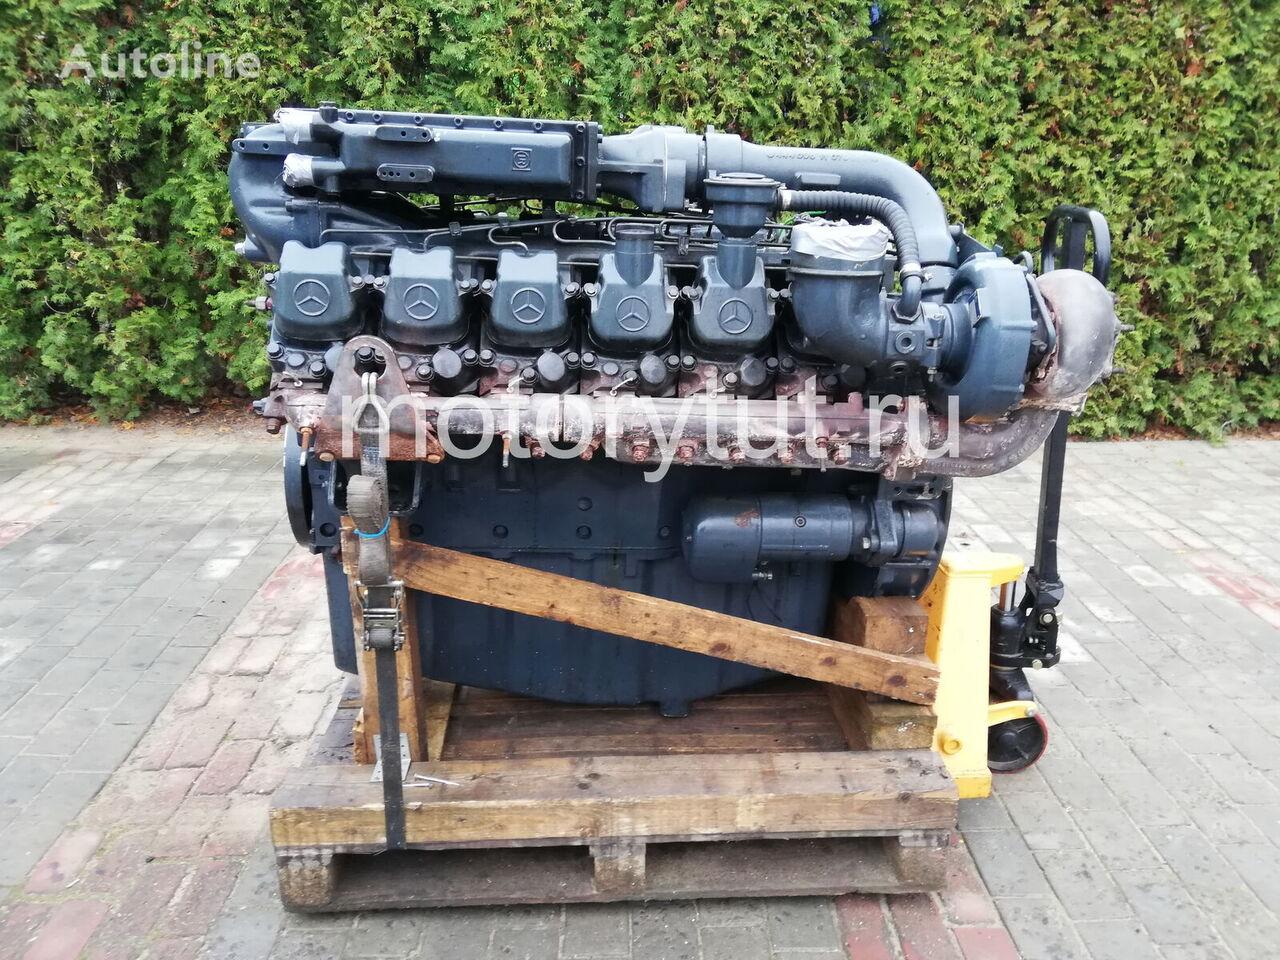 MTU 12V183TB32 (12V183TB 32) engine for WIRTGEN W2100 DCR asphalt milling machine